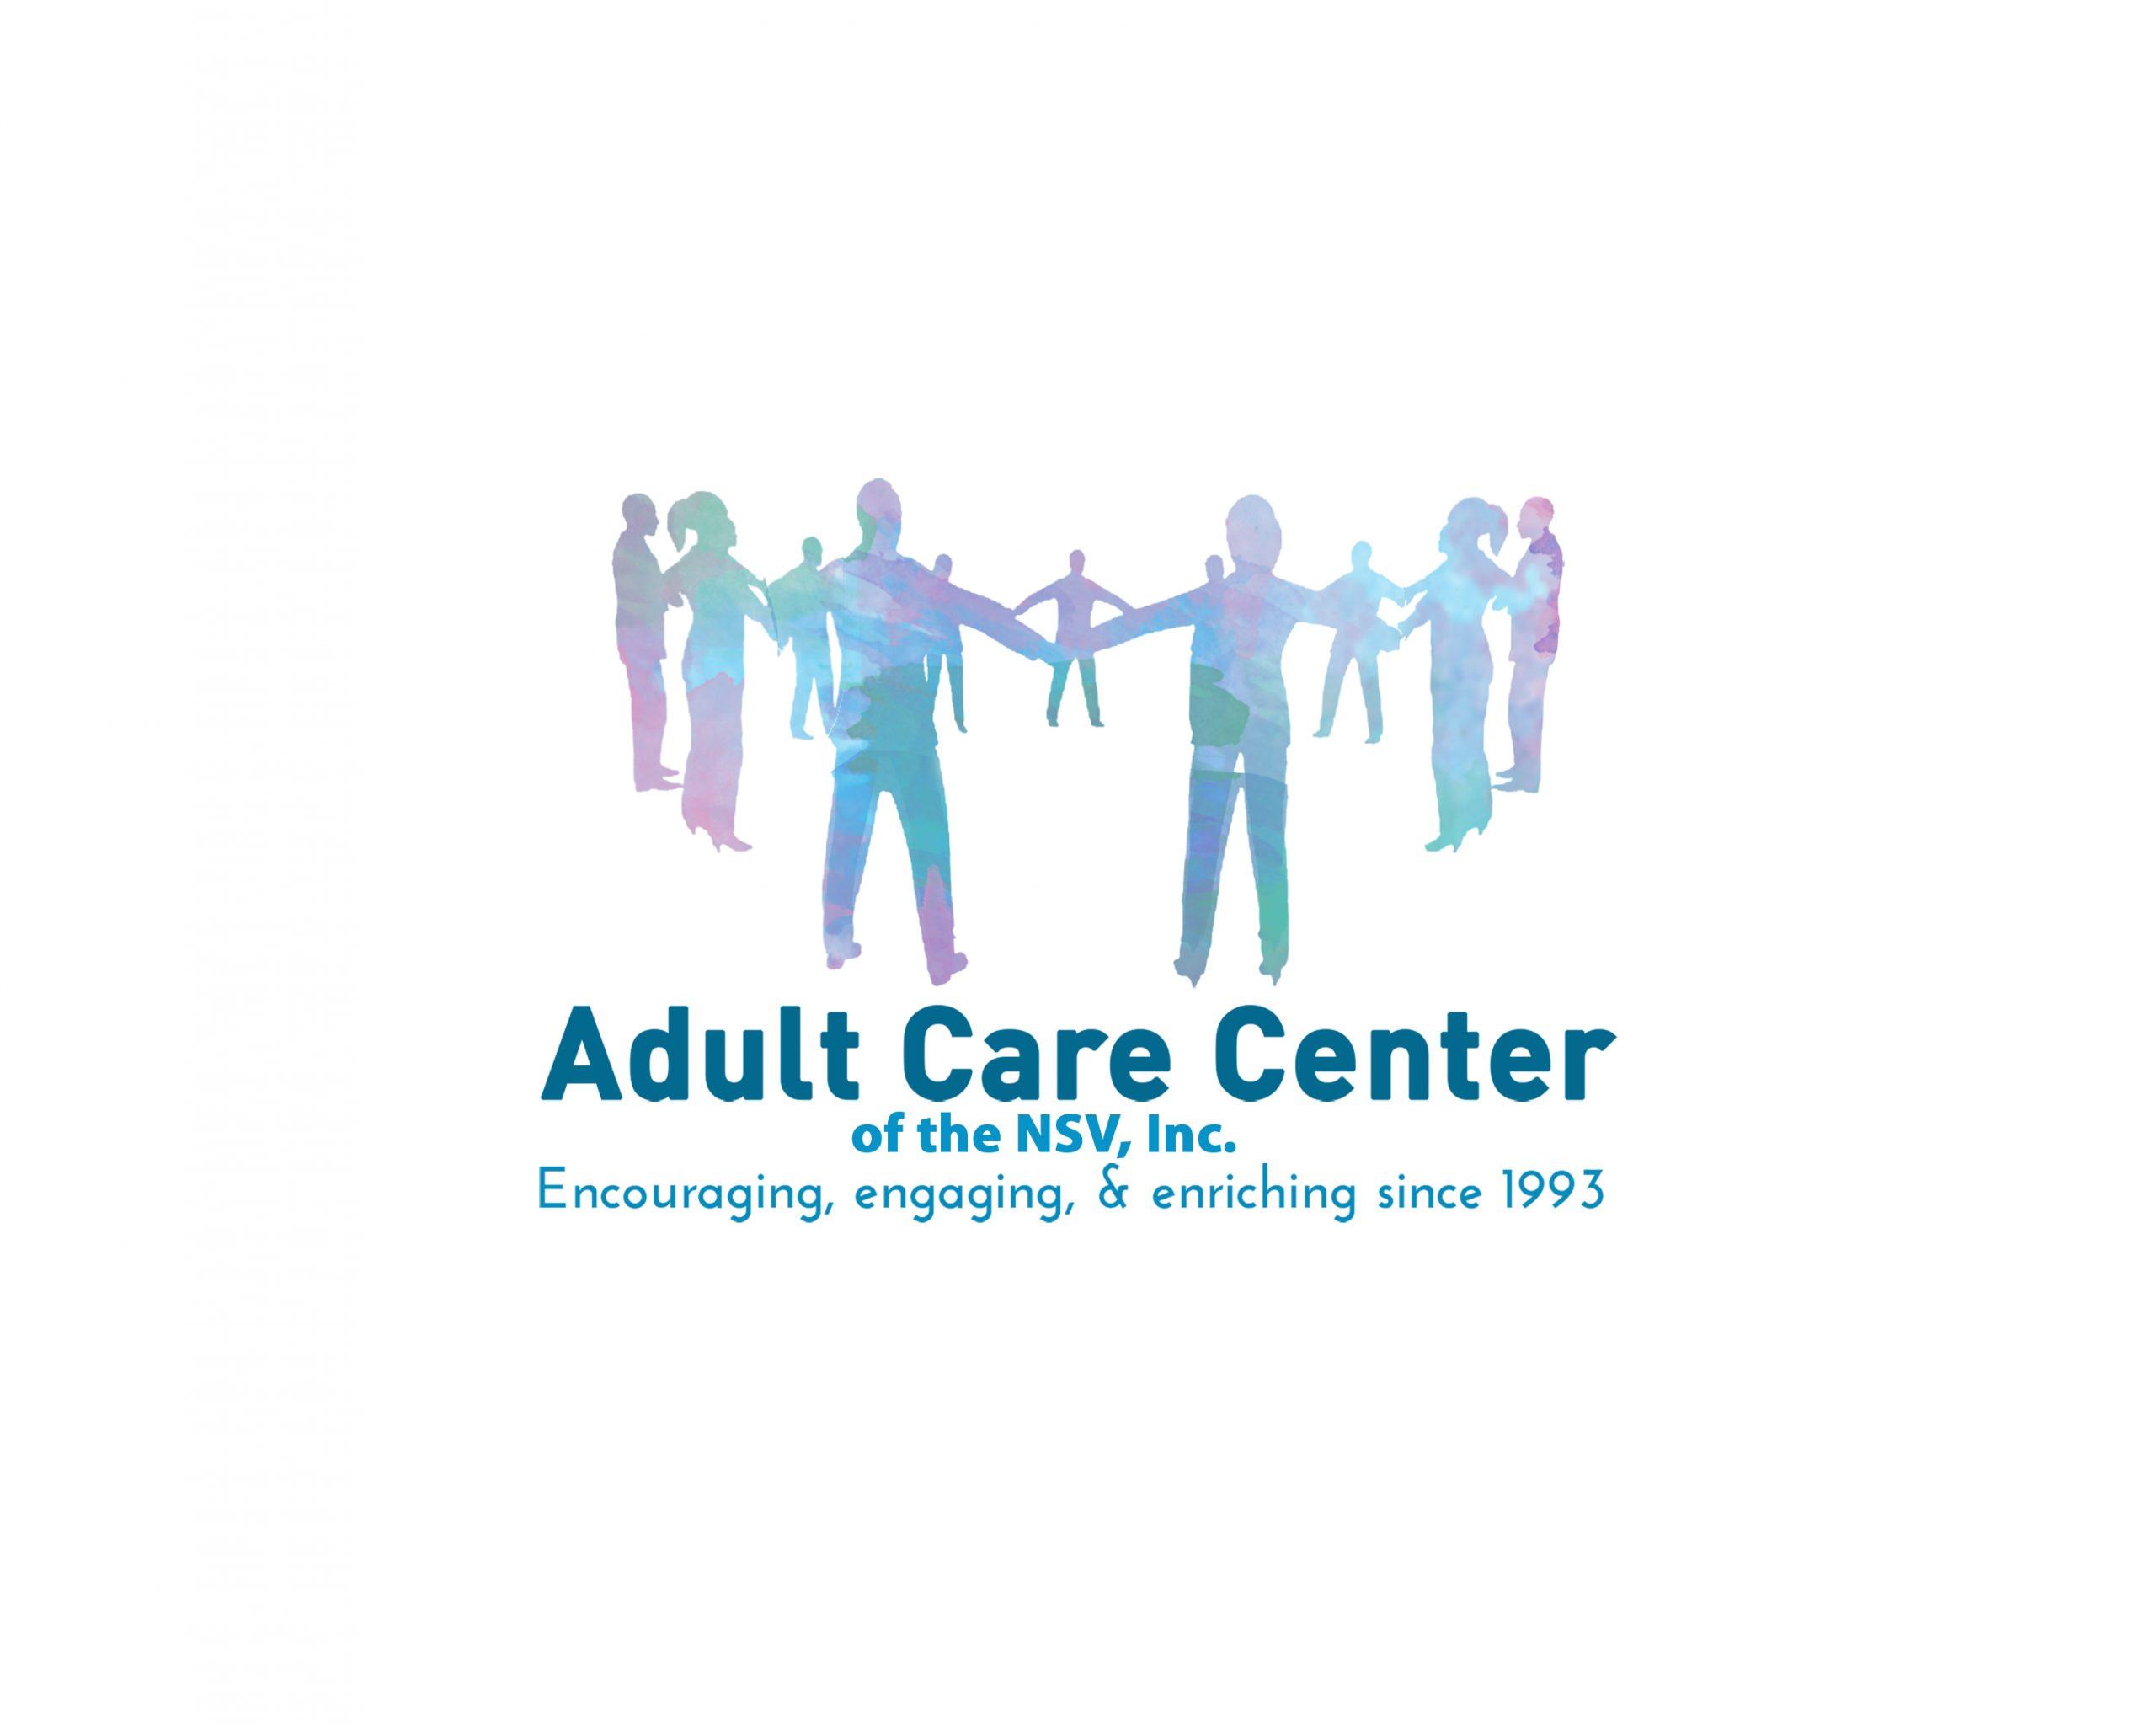 Adult_Care_Centeredit